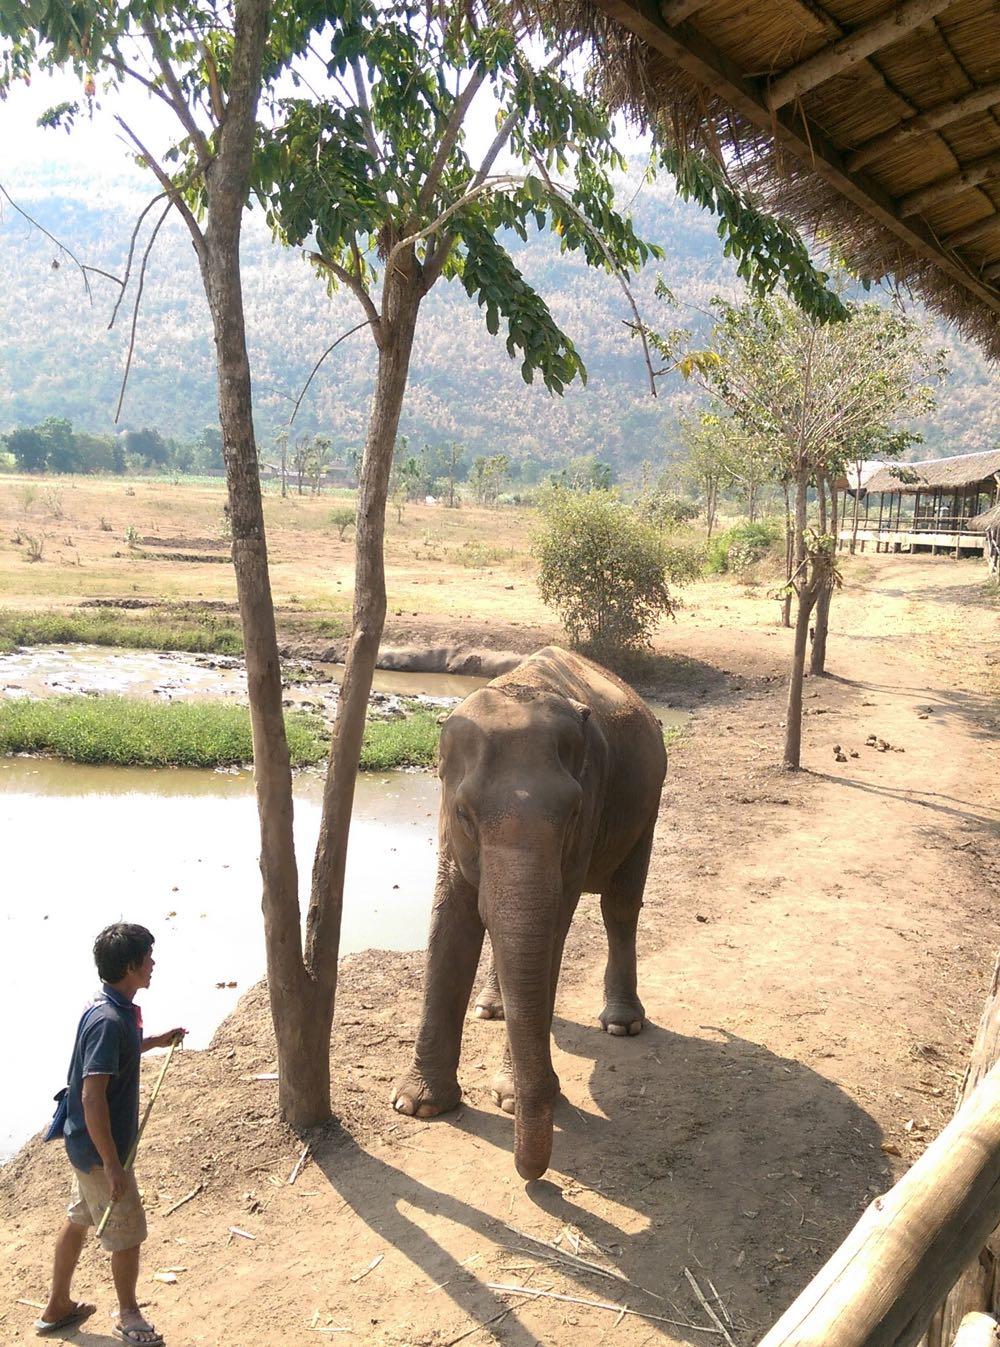 Elephants-World-08